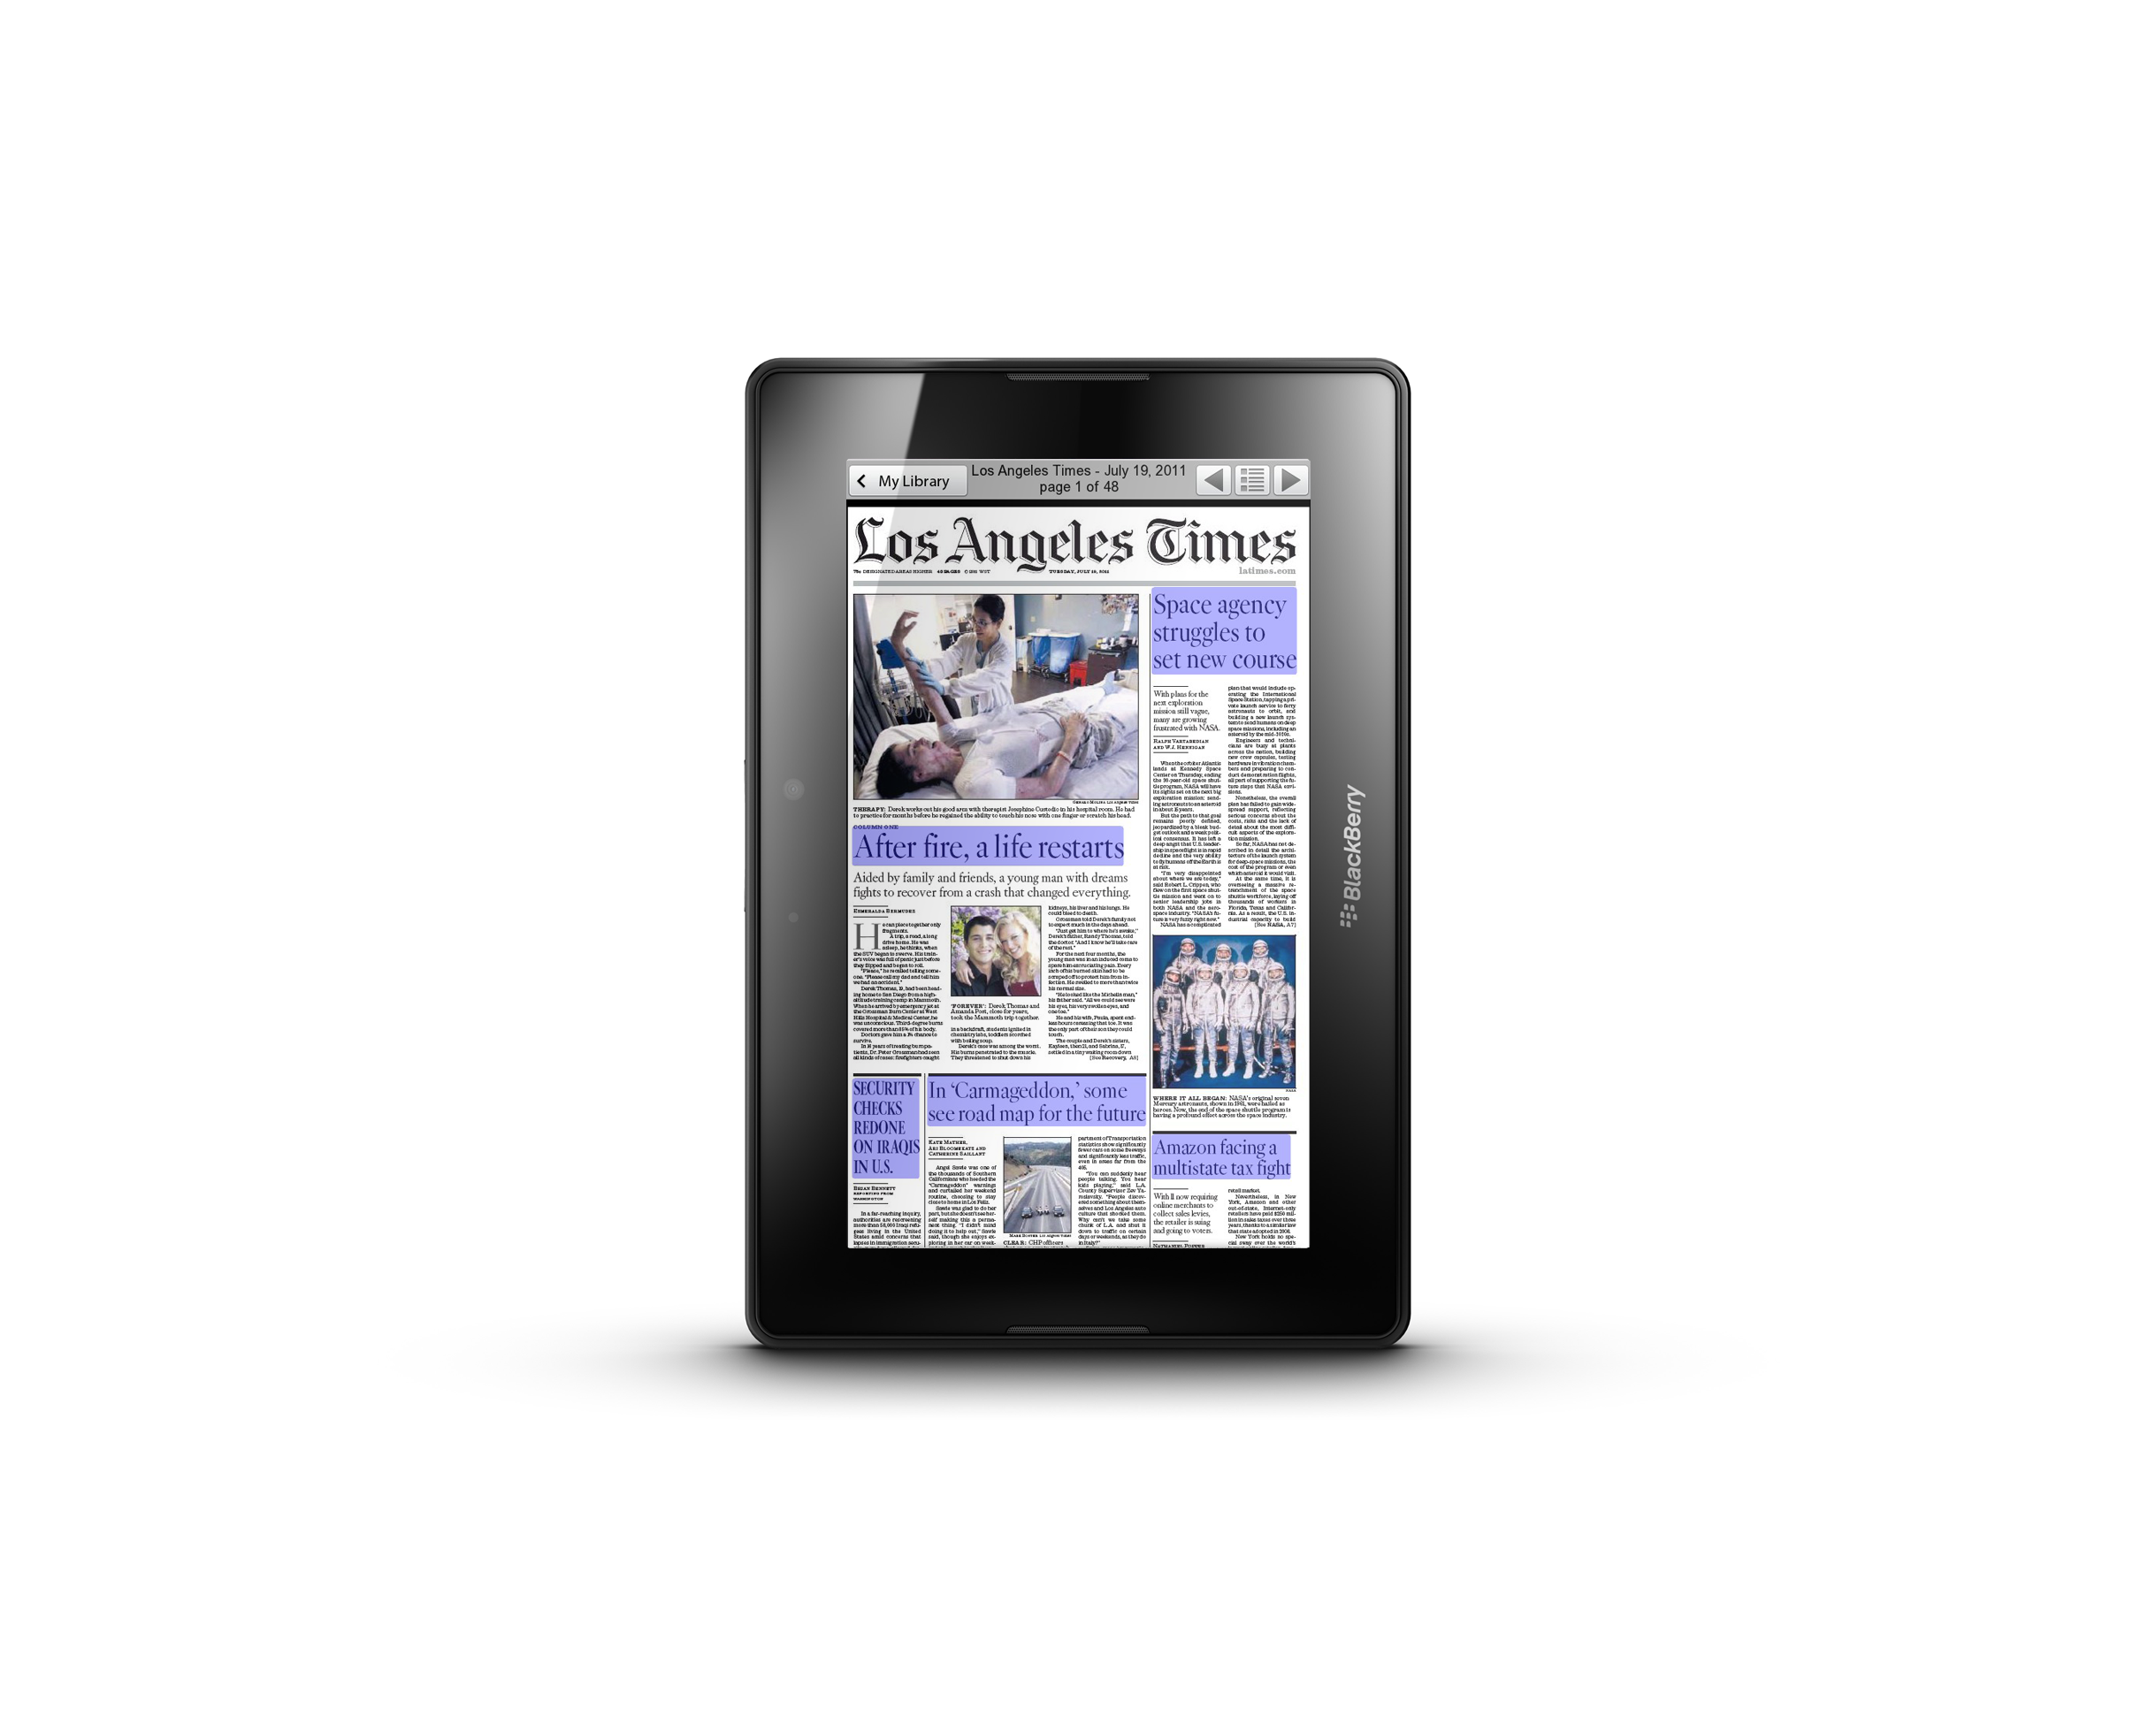 New PressReader for BlackBerry PlayBook Brings World's Top